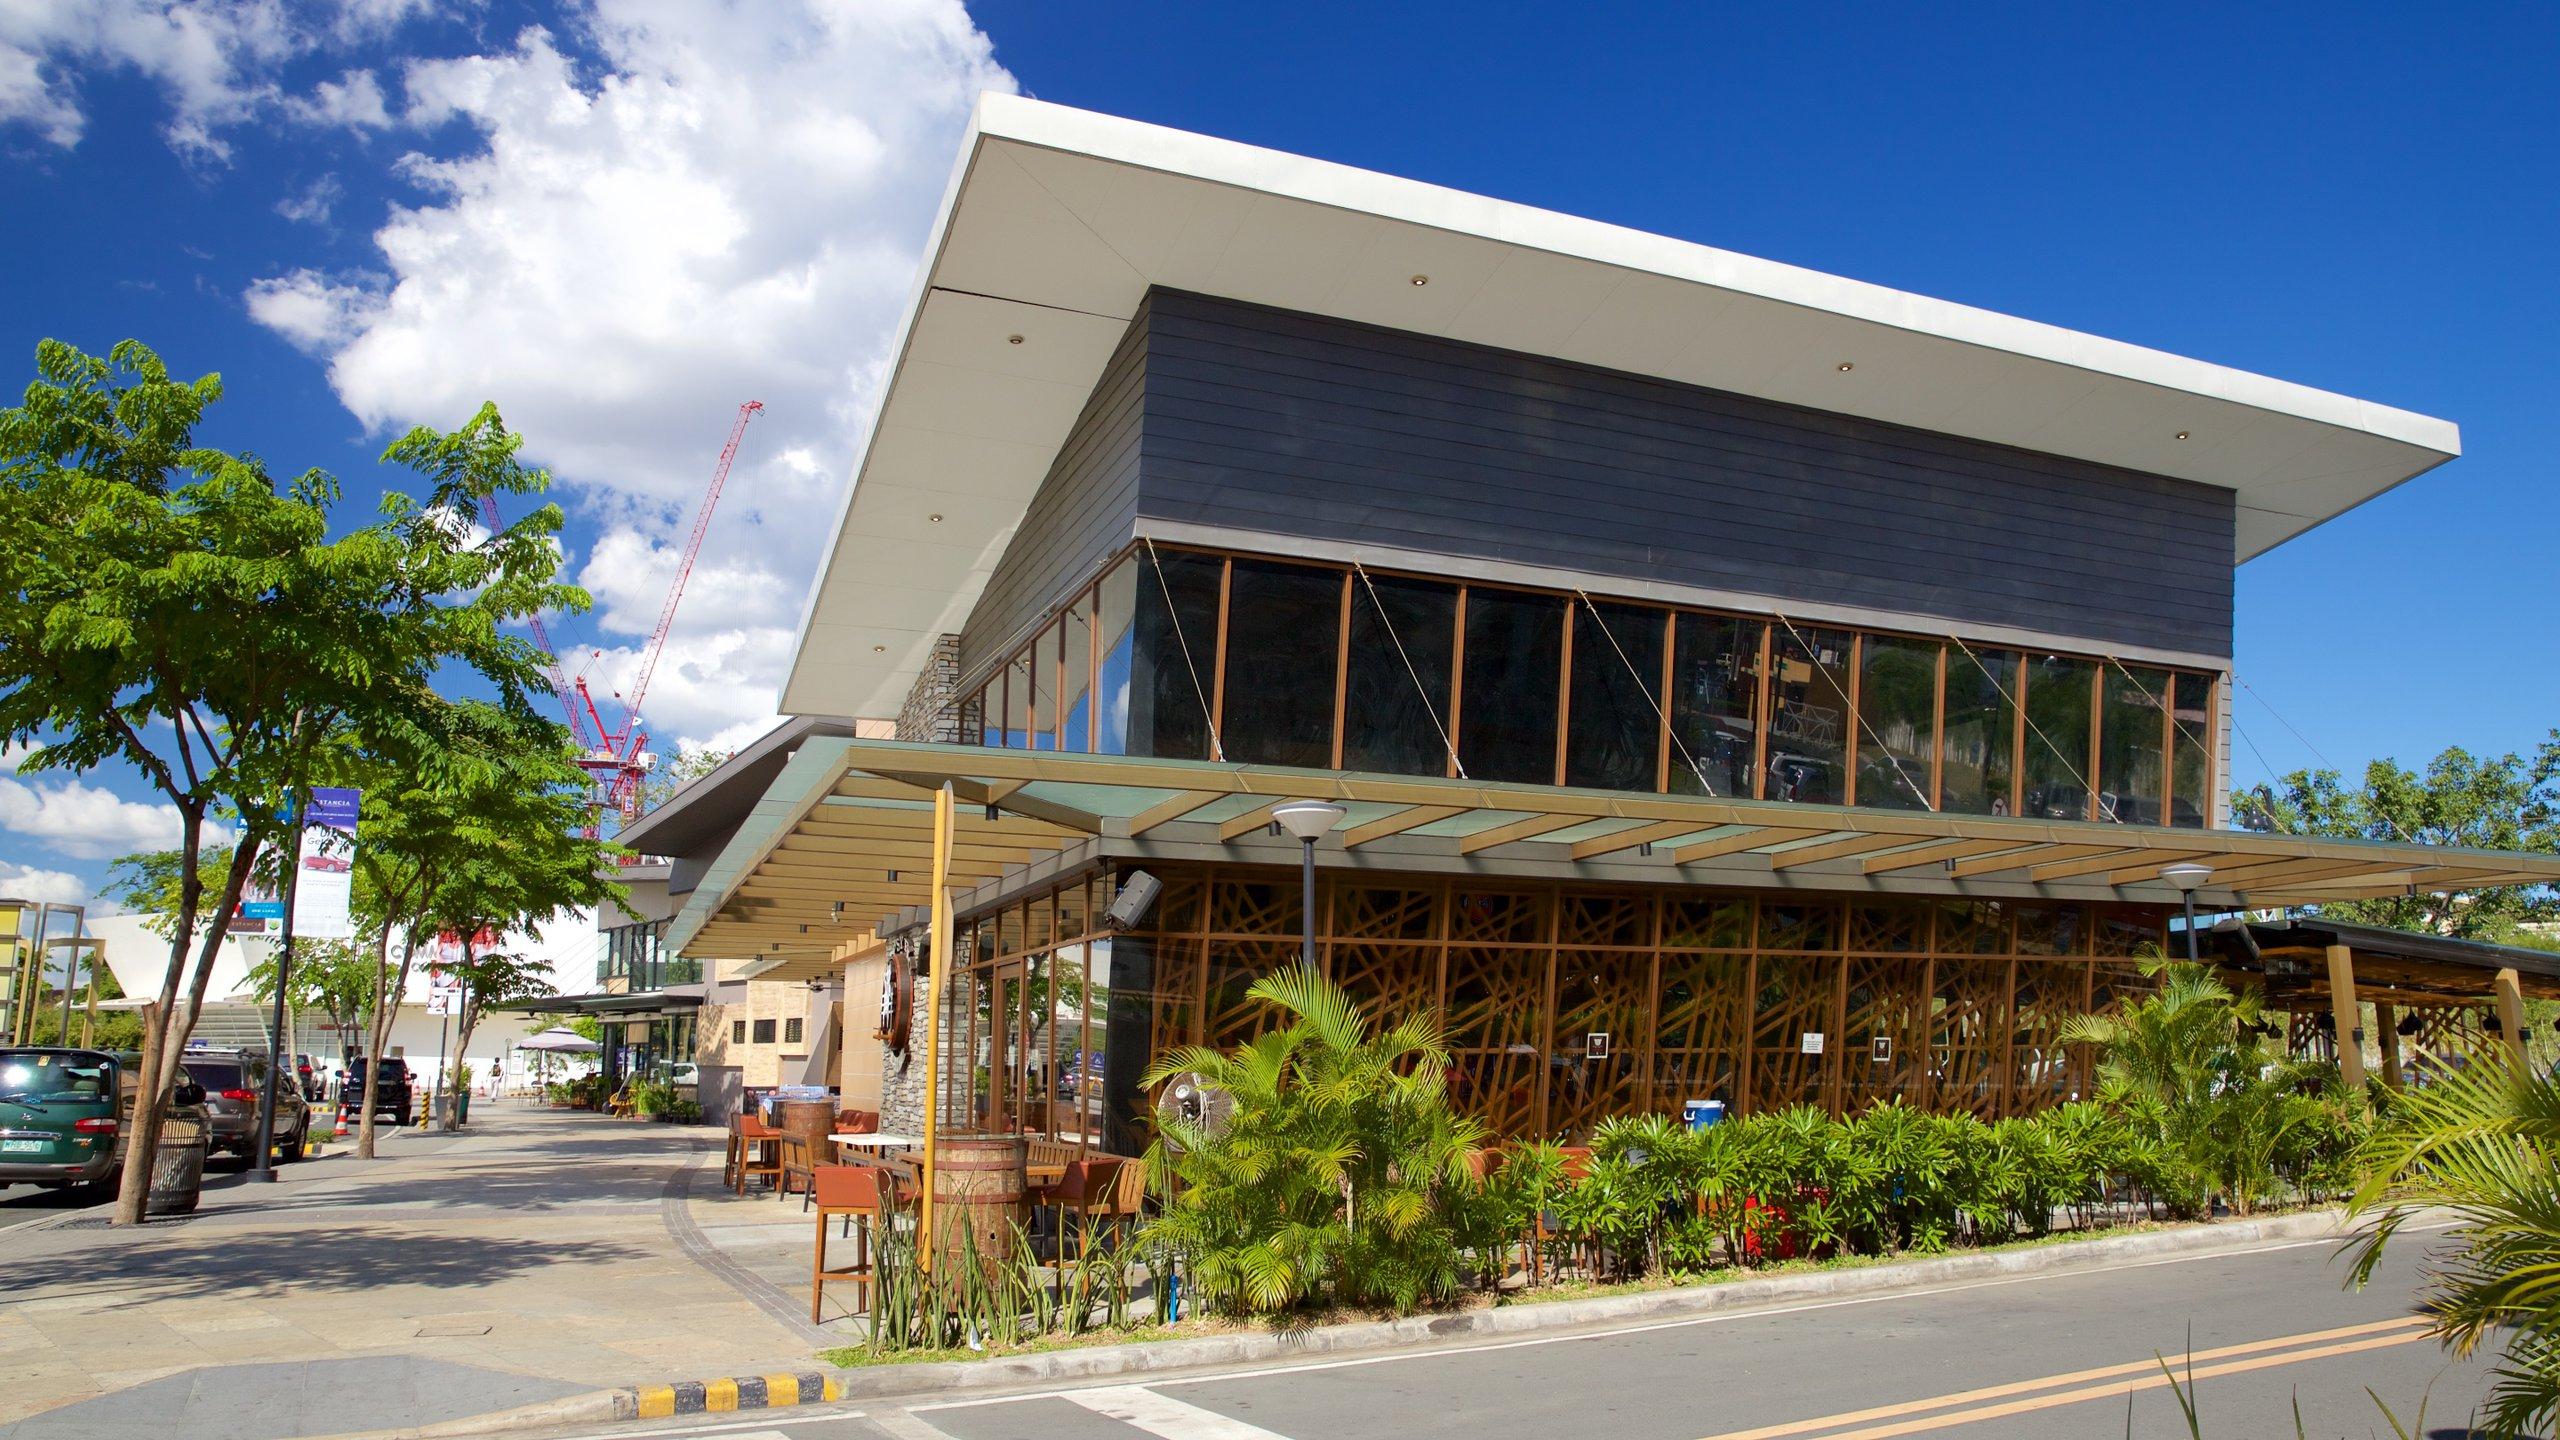 Pasig, National Capital Region, Philippines